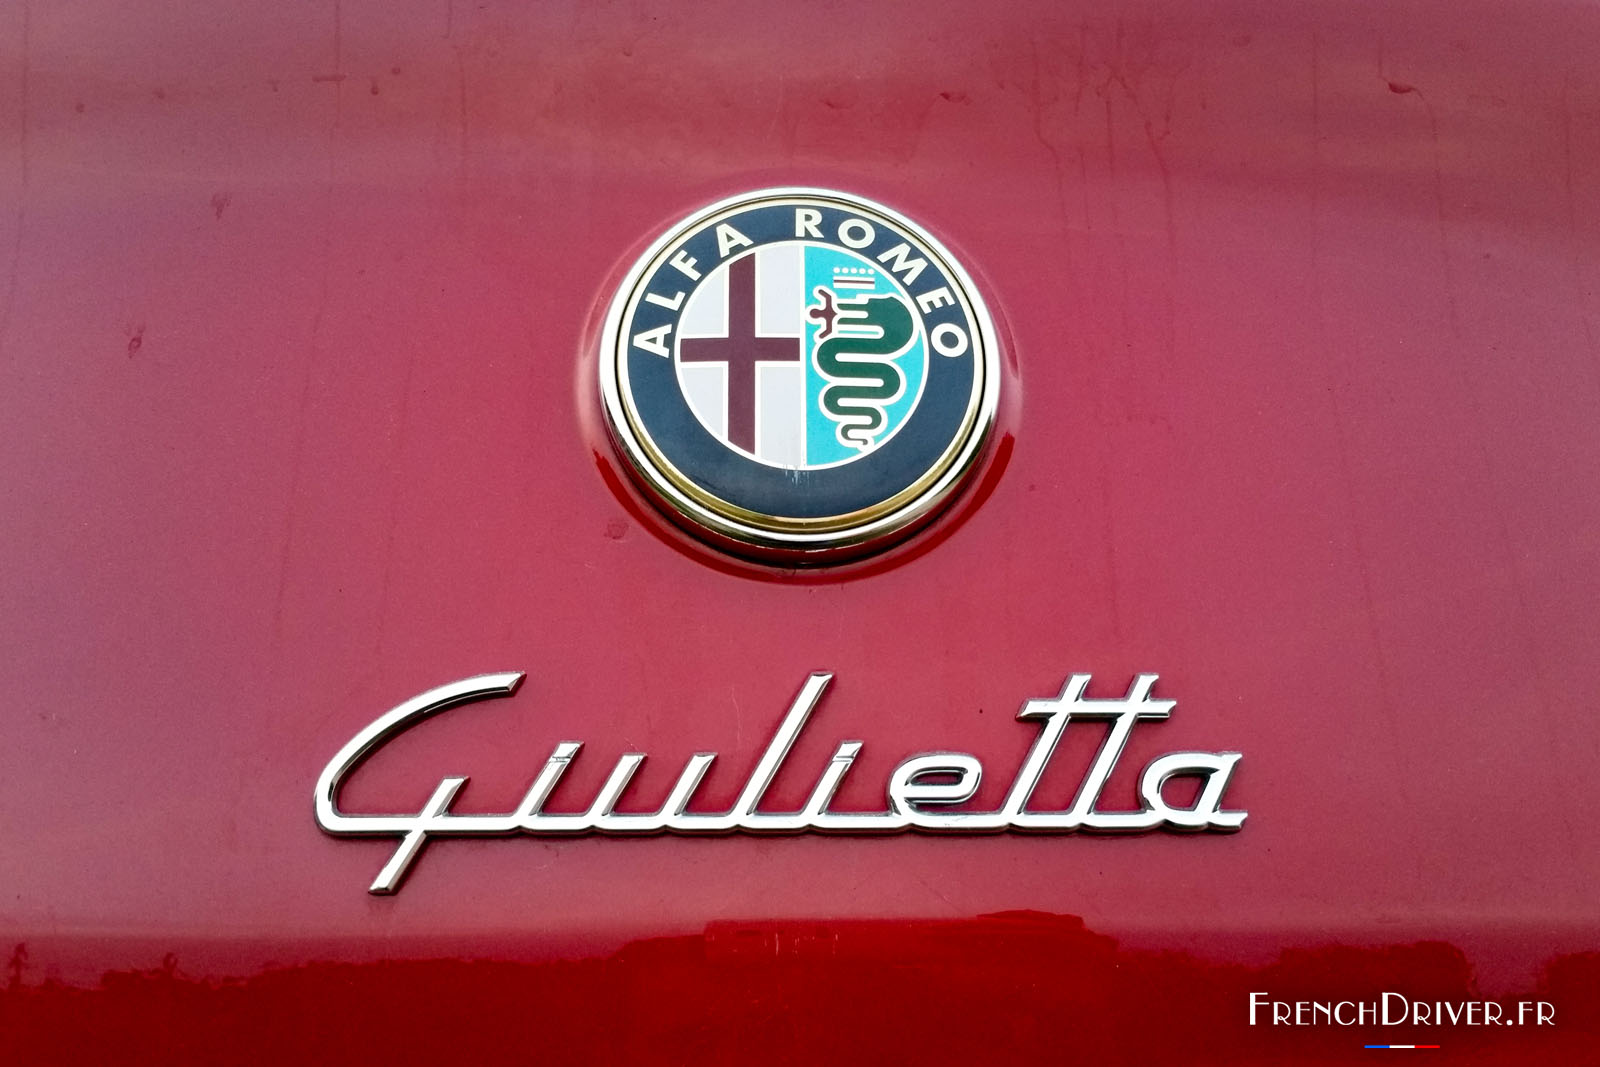 essai de l 39 alfa romeo giulietta sprint 60 ans d 39 histoire french driver. Black Bedroom Furniture Sets. Home Design Ideas